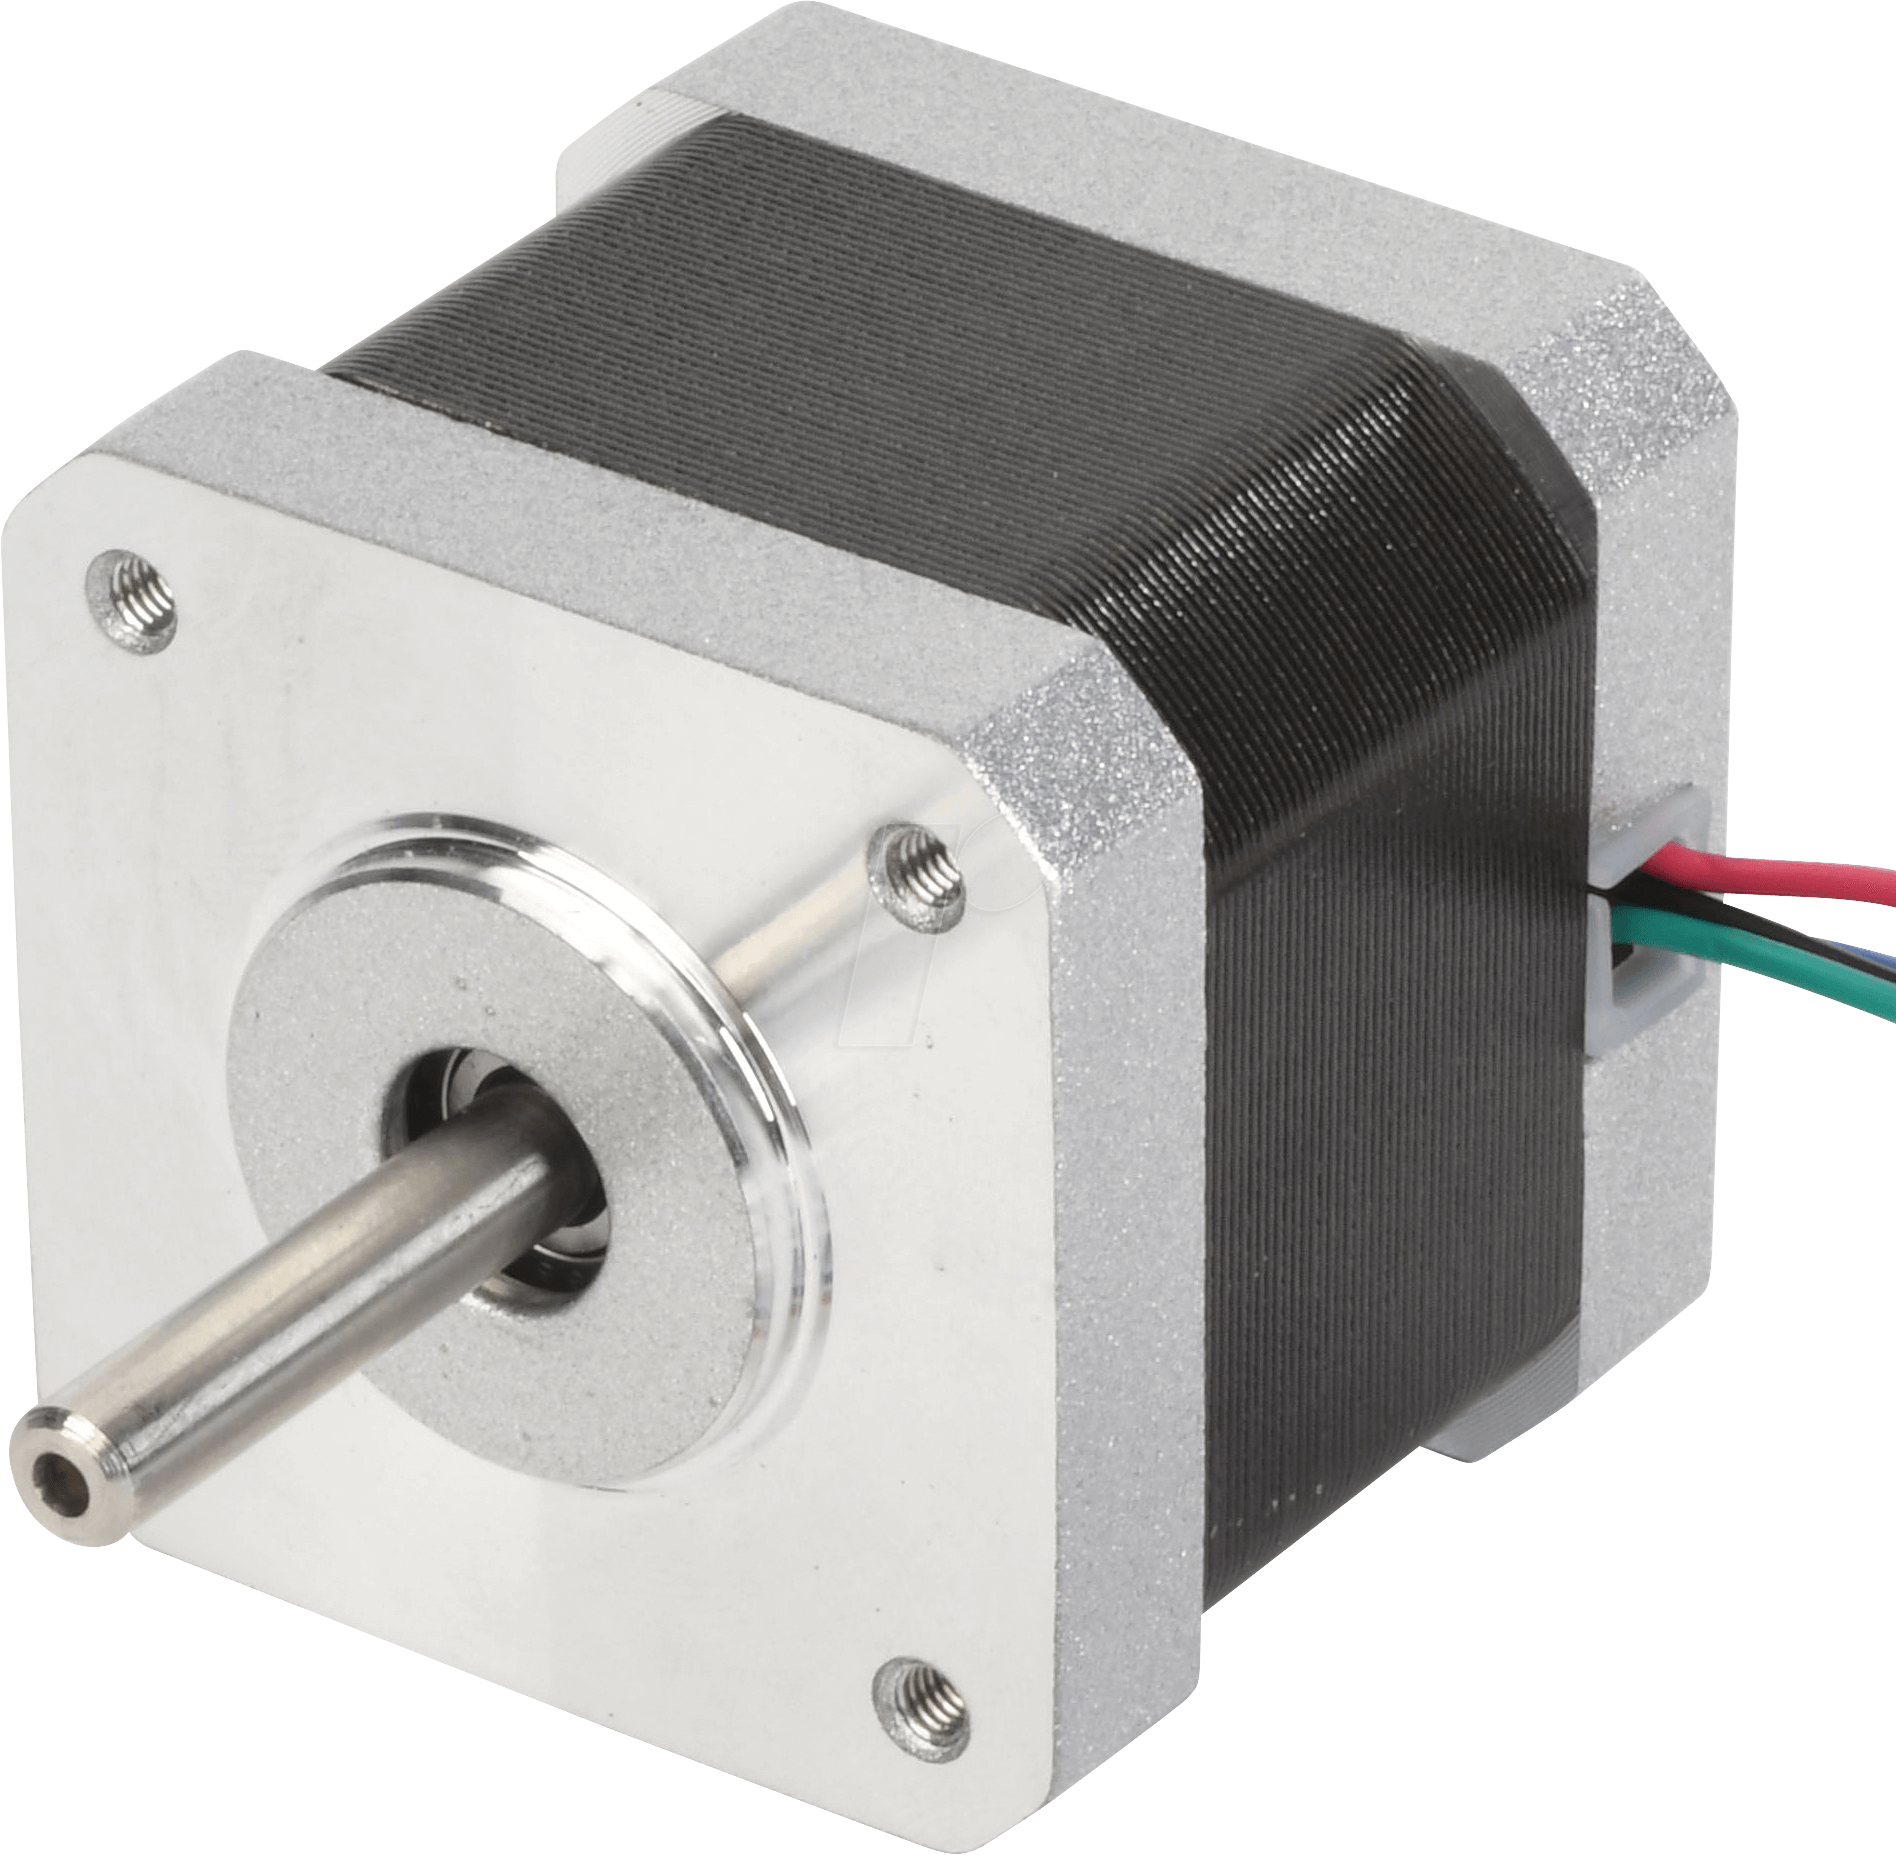 ACT 17HS4417 - Schrittmotor, 4 pol, 1,8 °, 2,55 V DC